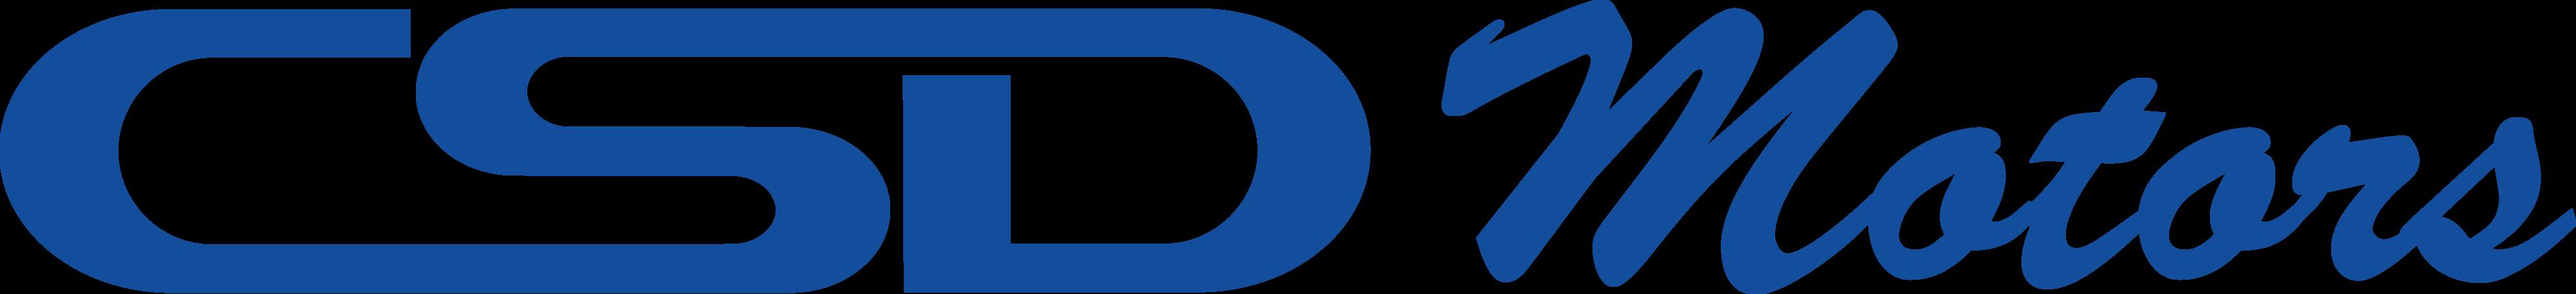 CSD Motors EN